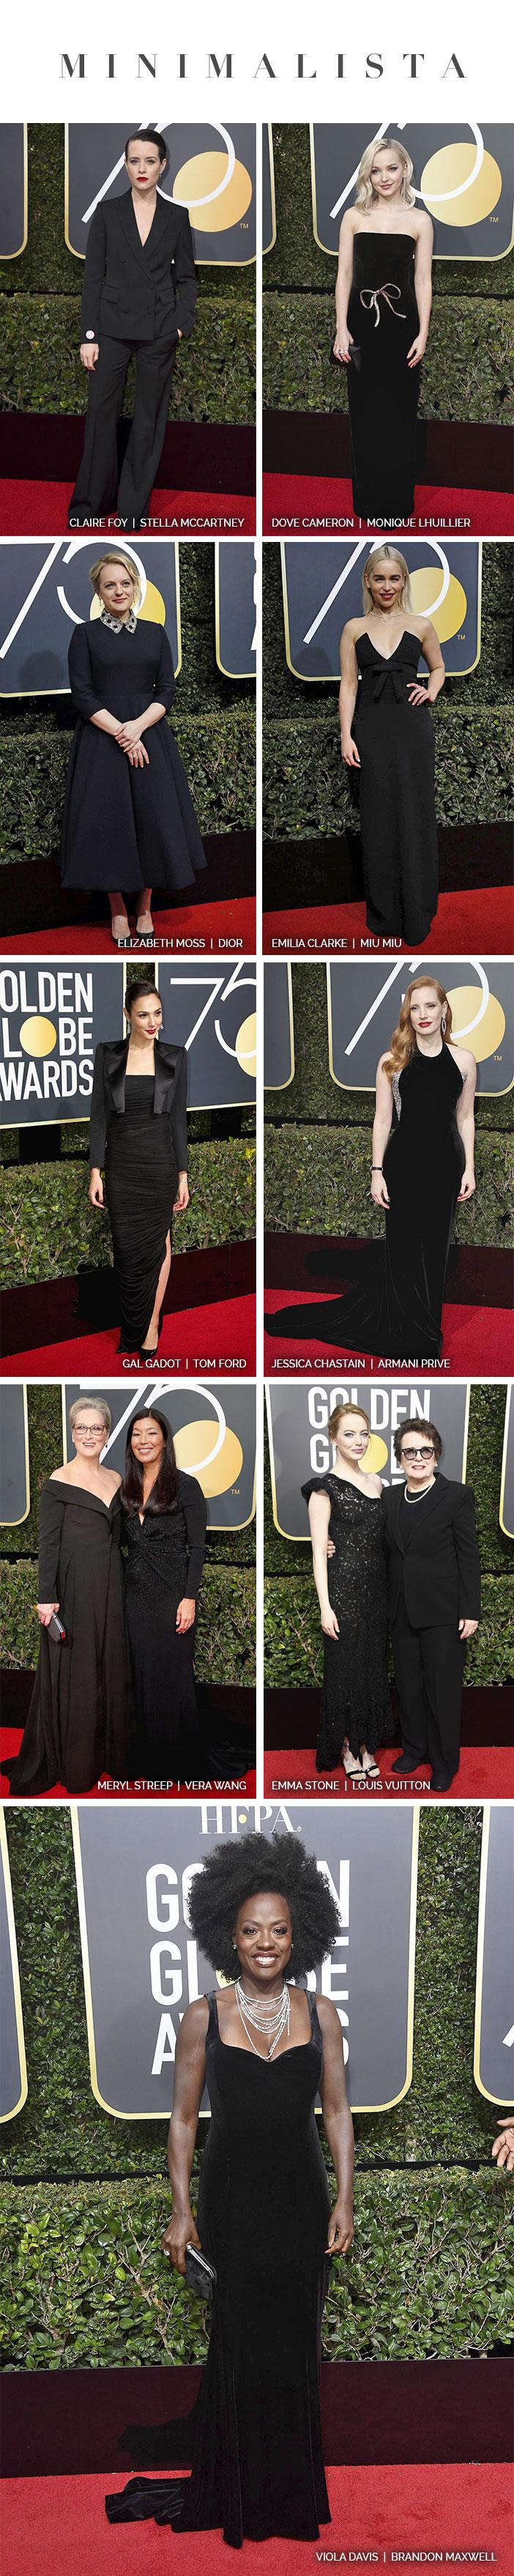 Red carpet: Golden Globe Awards 2018 - Looks Minimalistas